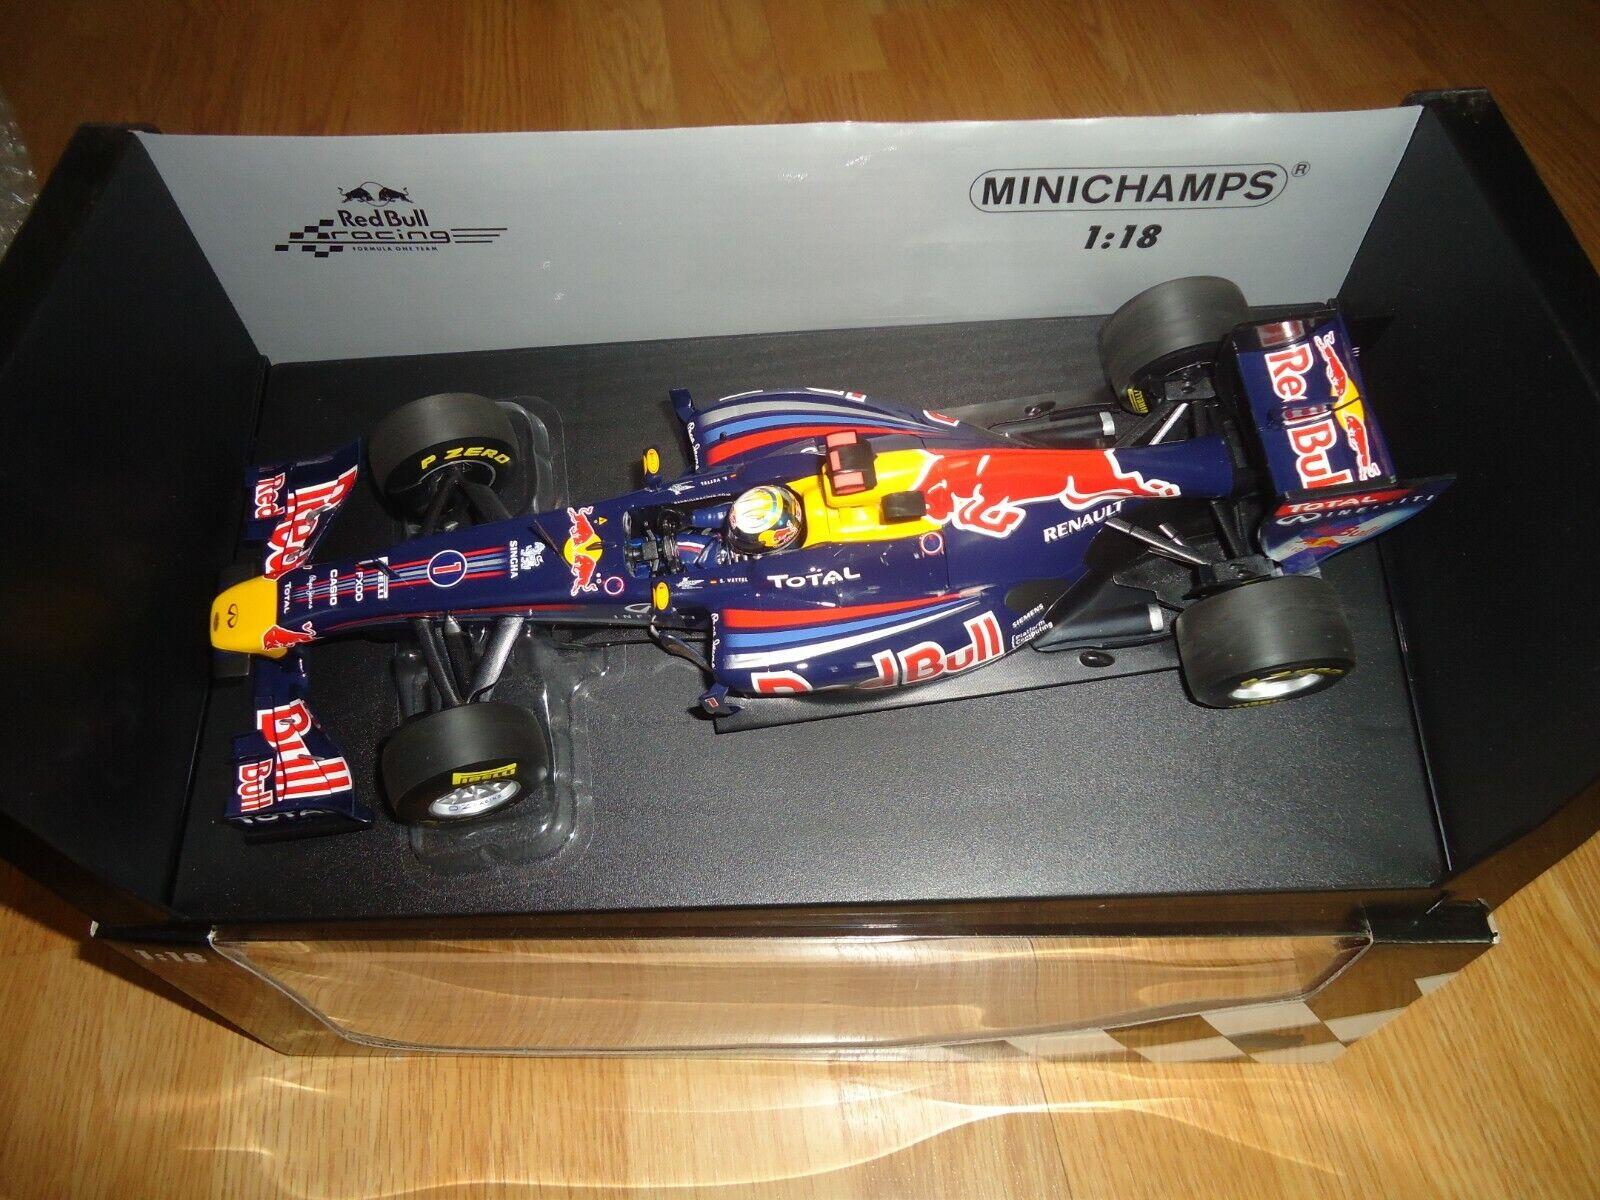 rouge Bull Racing Renault RB7 - S. Vettel 2011 - Minichamps 1 18°